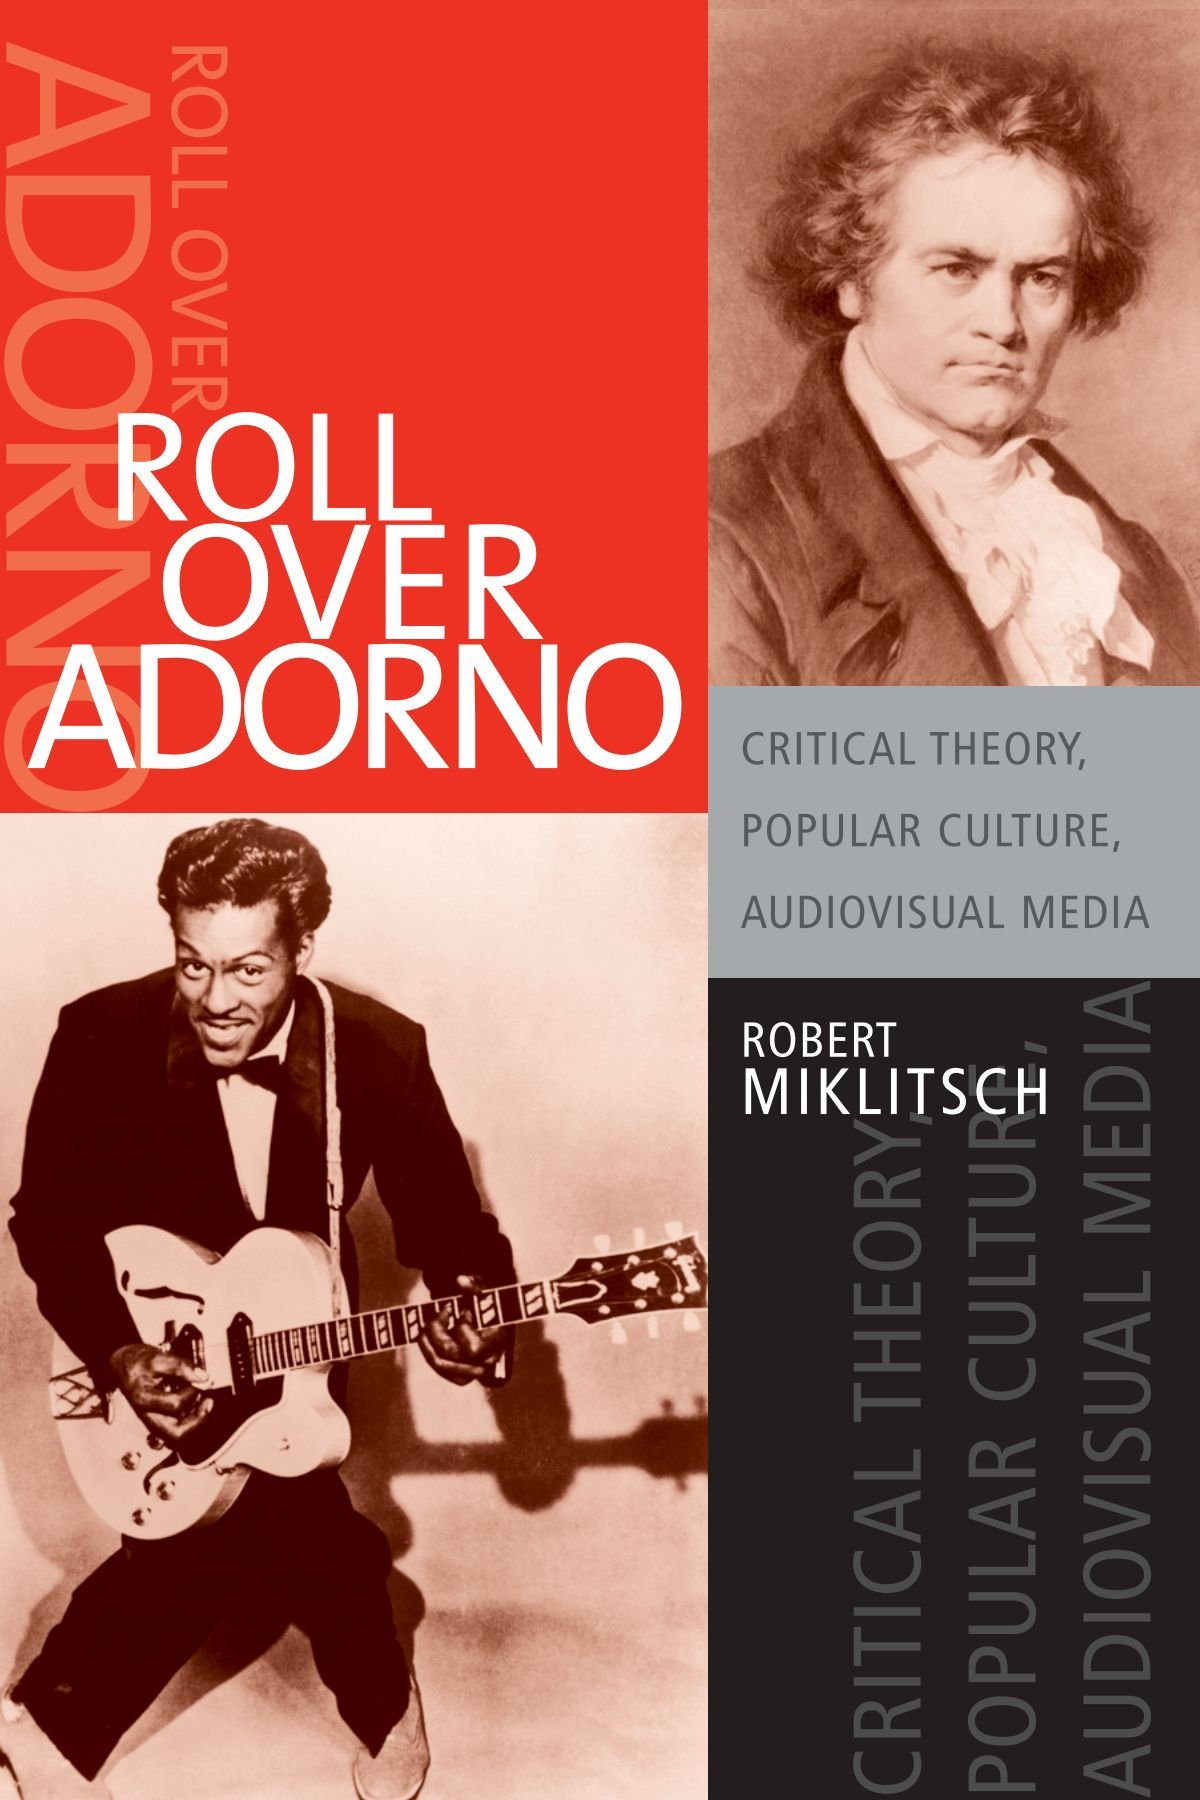 Download Roll Over Adorno: Critical Theory, Popular Culture, Audiovisual Media (SUNY series in Postmodern Culture) pdf epub